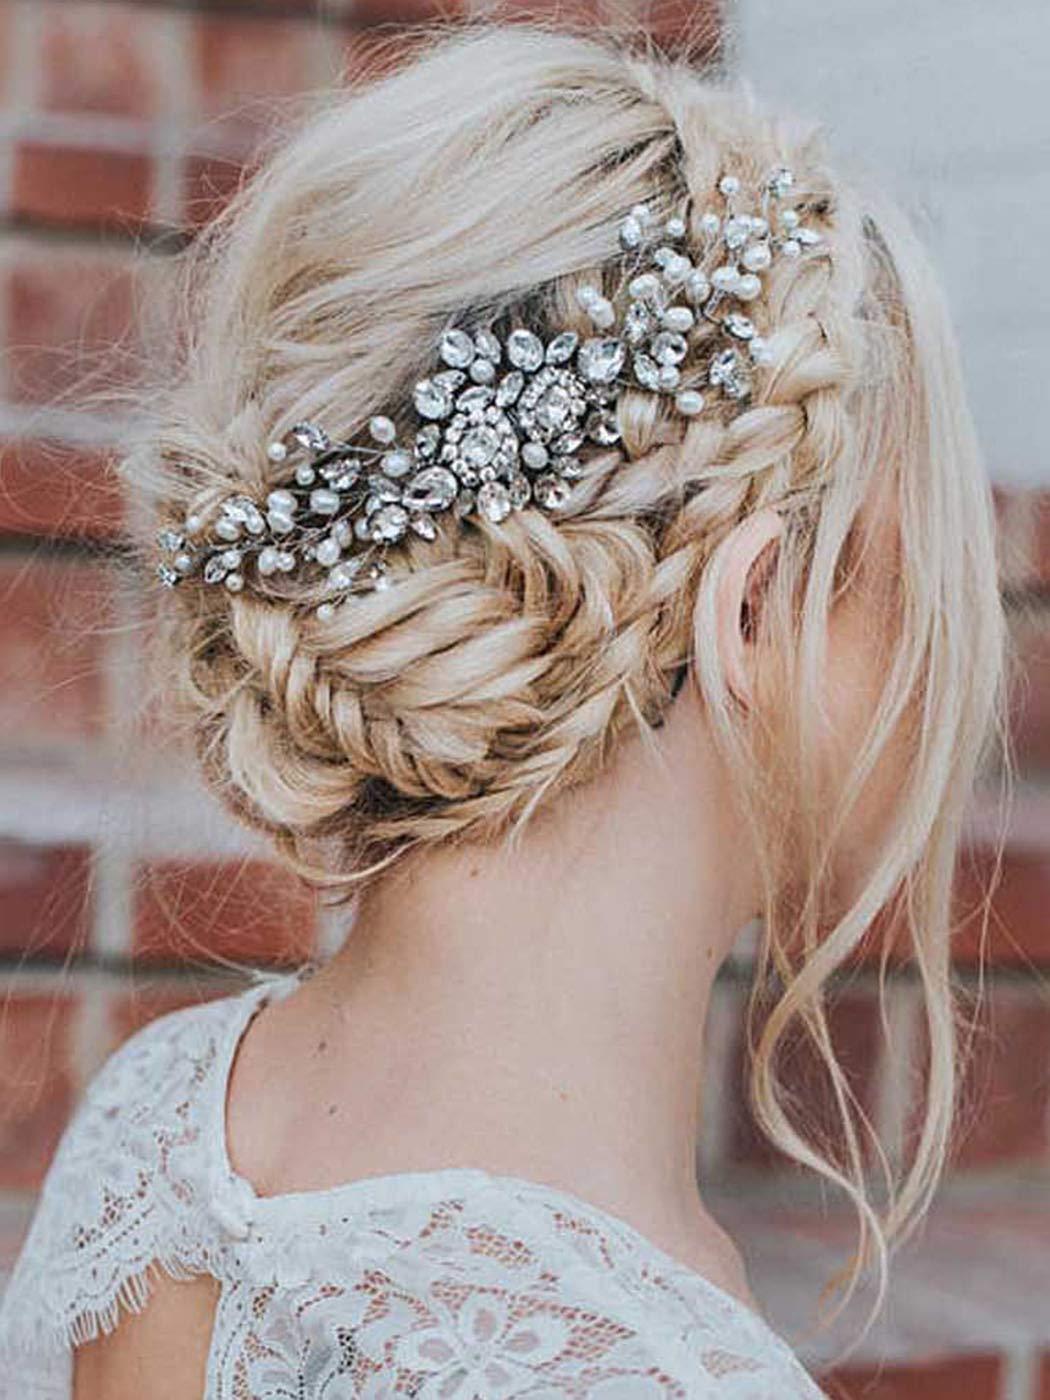 Barogirl Bride Hair Comb Wedding Rhinestones Headpiece Boho Bridal Flower Hair Accessories for Women (Silver) by Barogirl